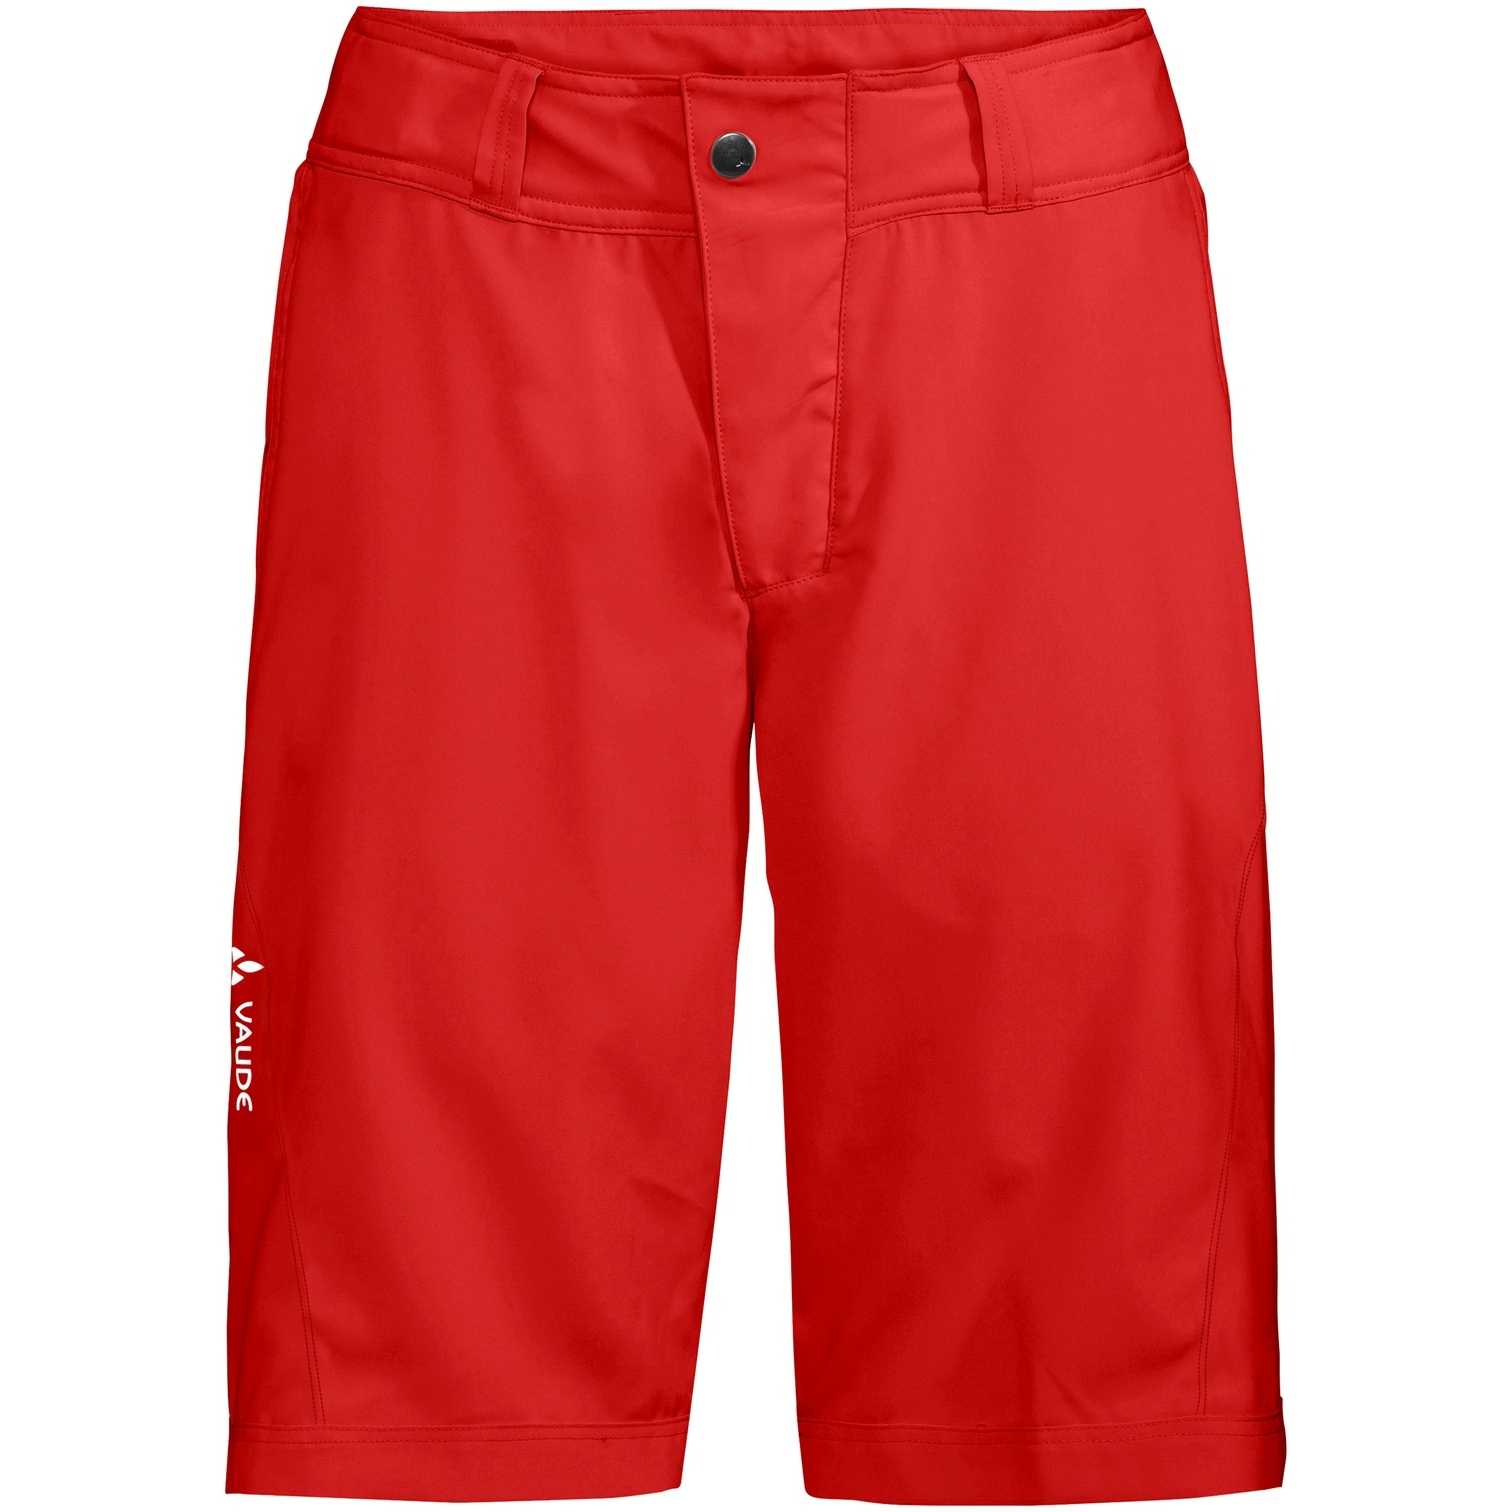 Vaude Ledro Damen Shorts - mars red